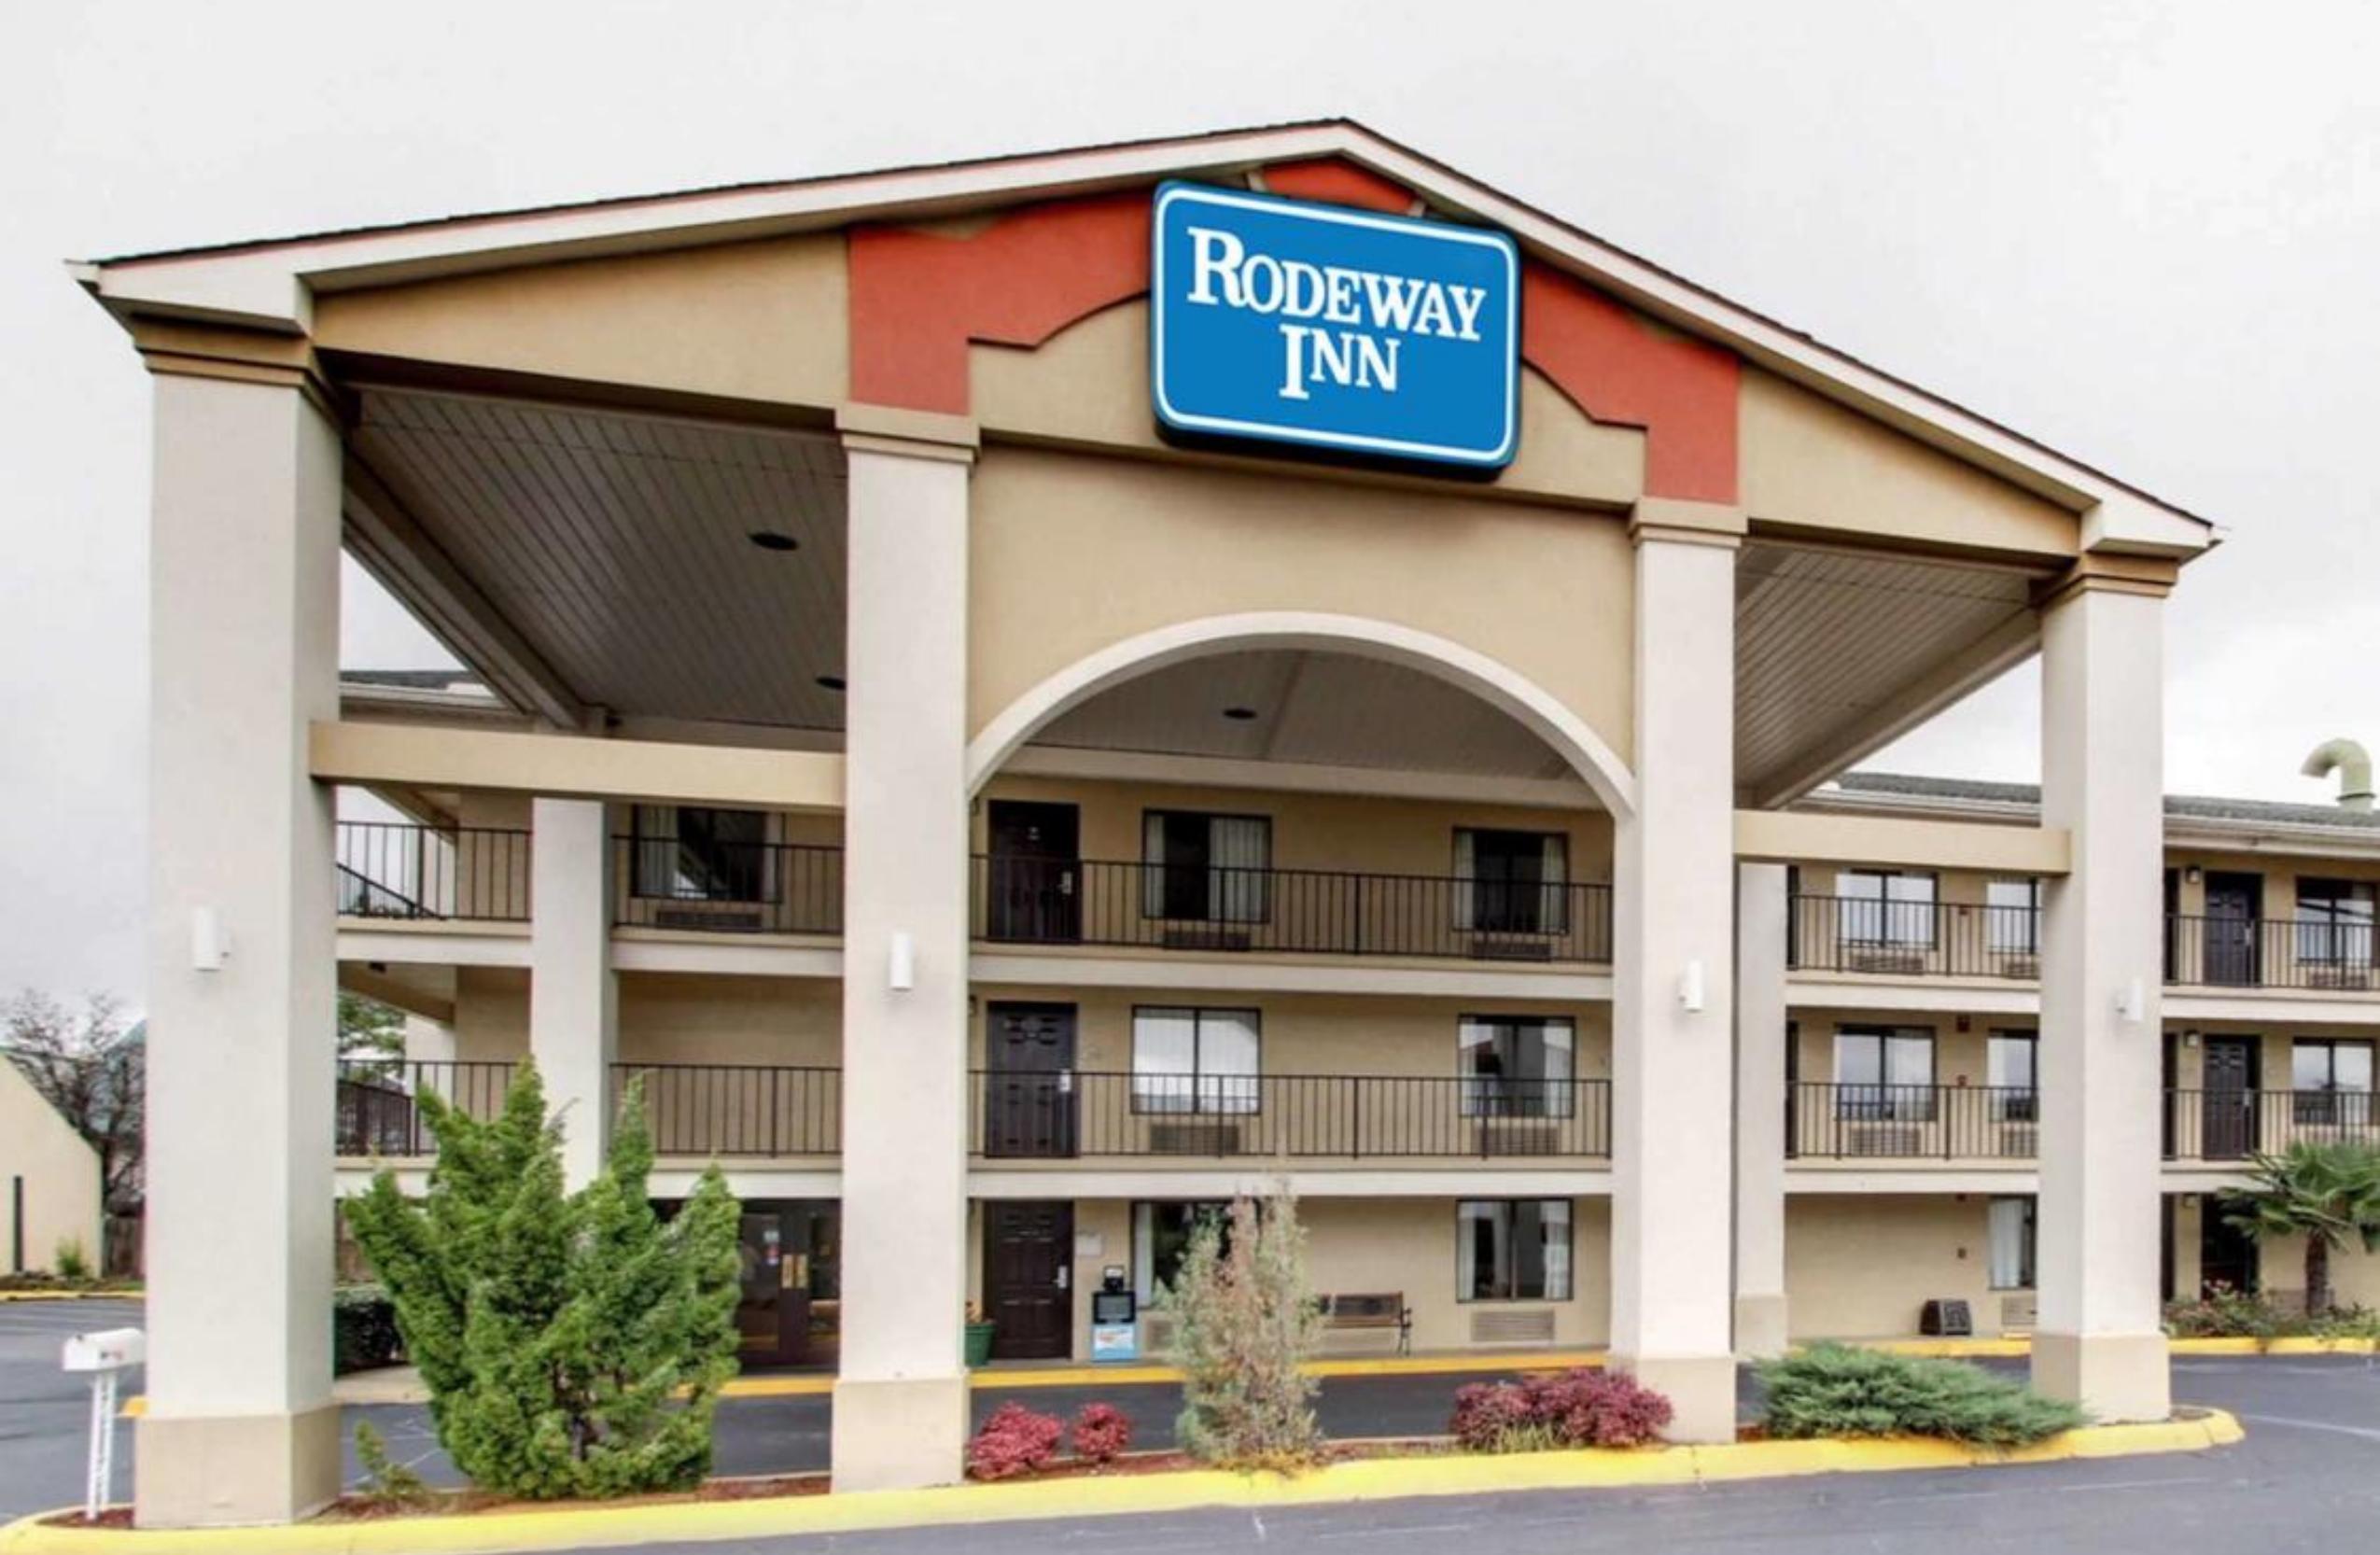 Rodeway Inn - Ridgeland, MS